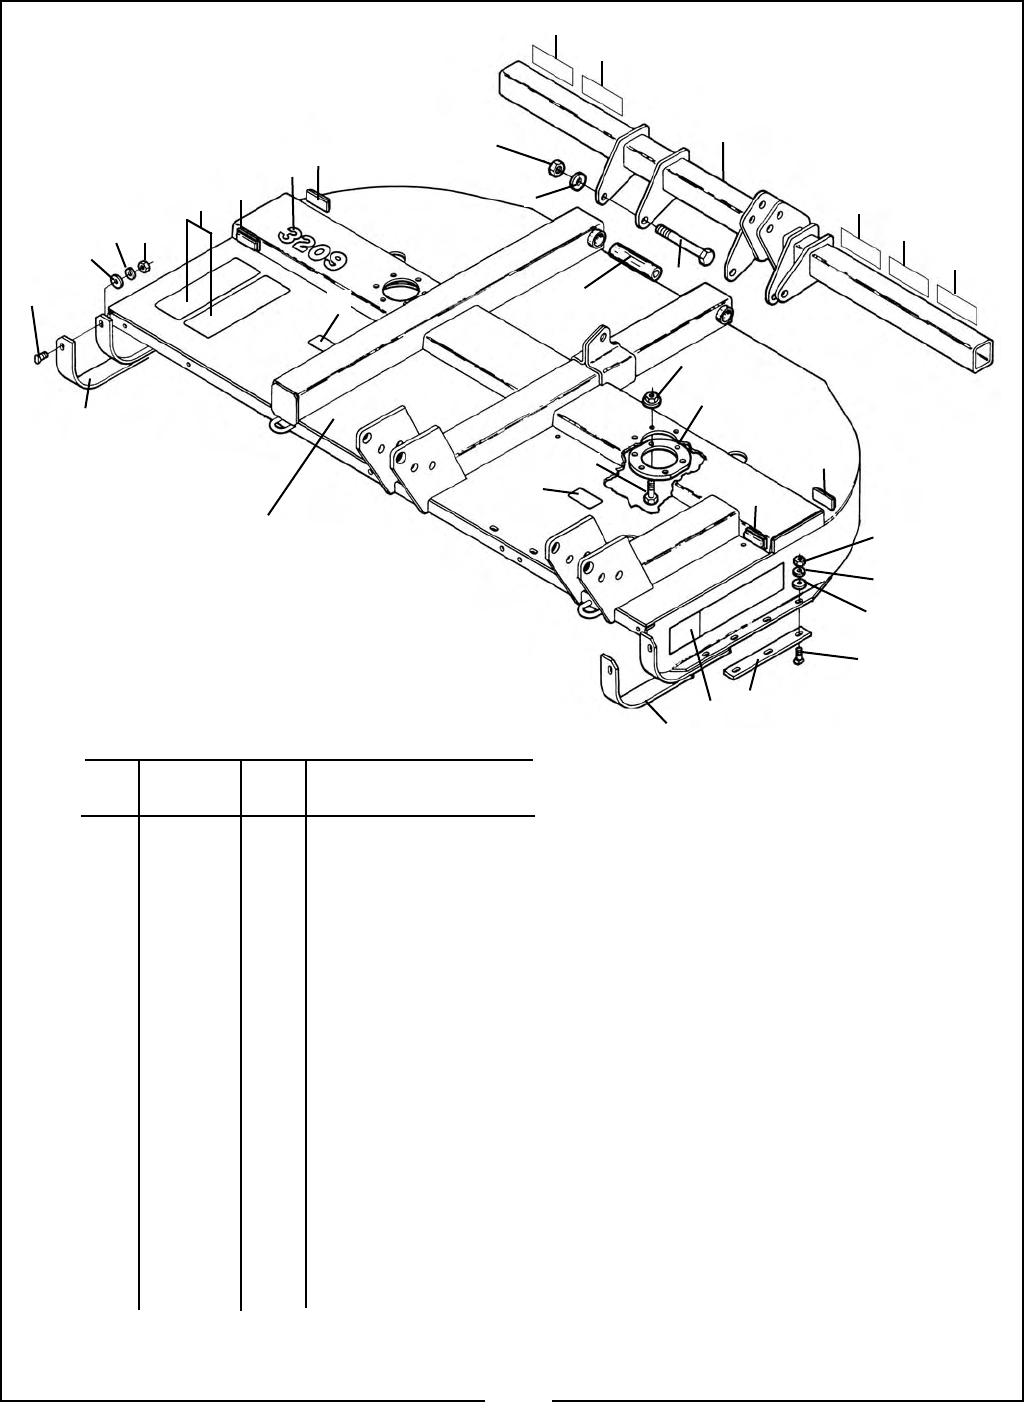 3210 Offset Bhrotary Cutter3200series Pm 11 Bush Hog Schematics Land Maintenance Repair Parts Manual